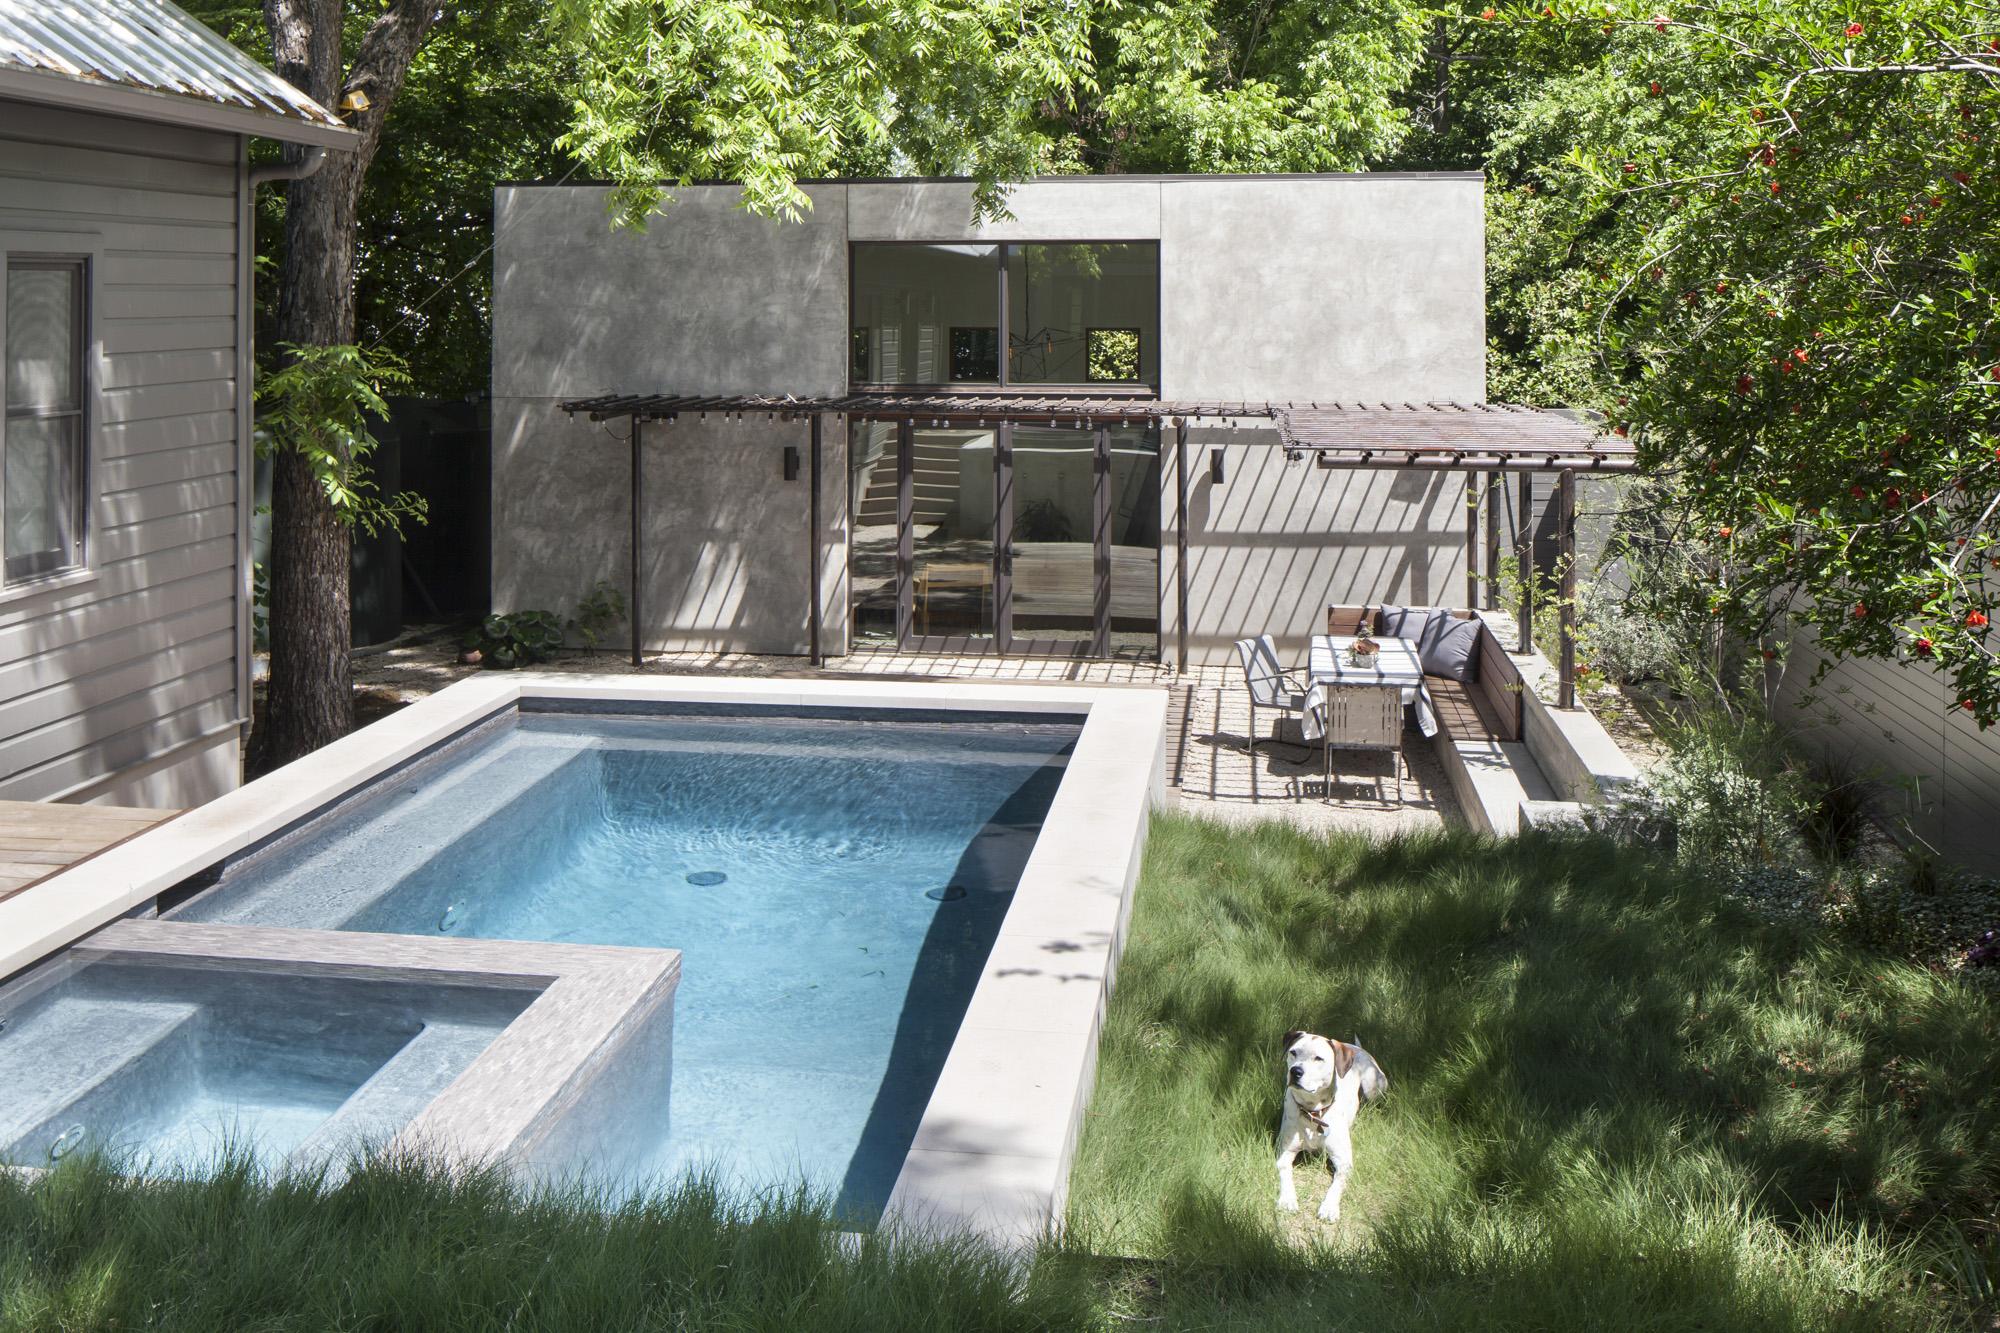 Elizabeth-Baird-Architecture-Garner Pool and Casita- casita lawn and pool.jpg